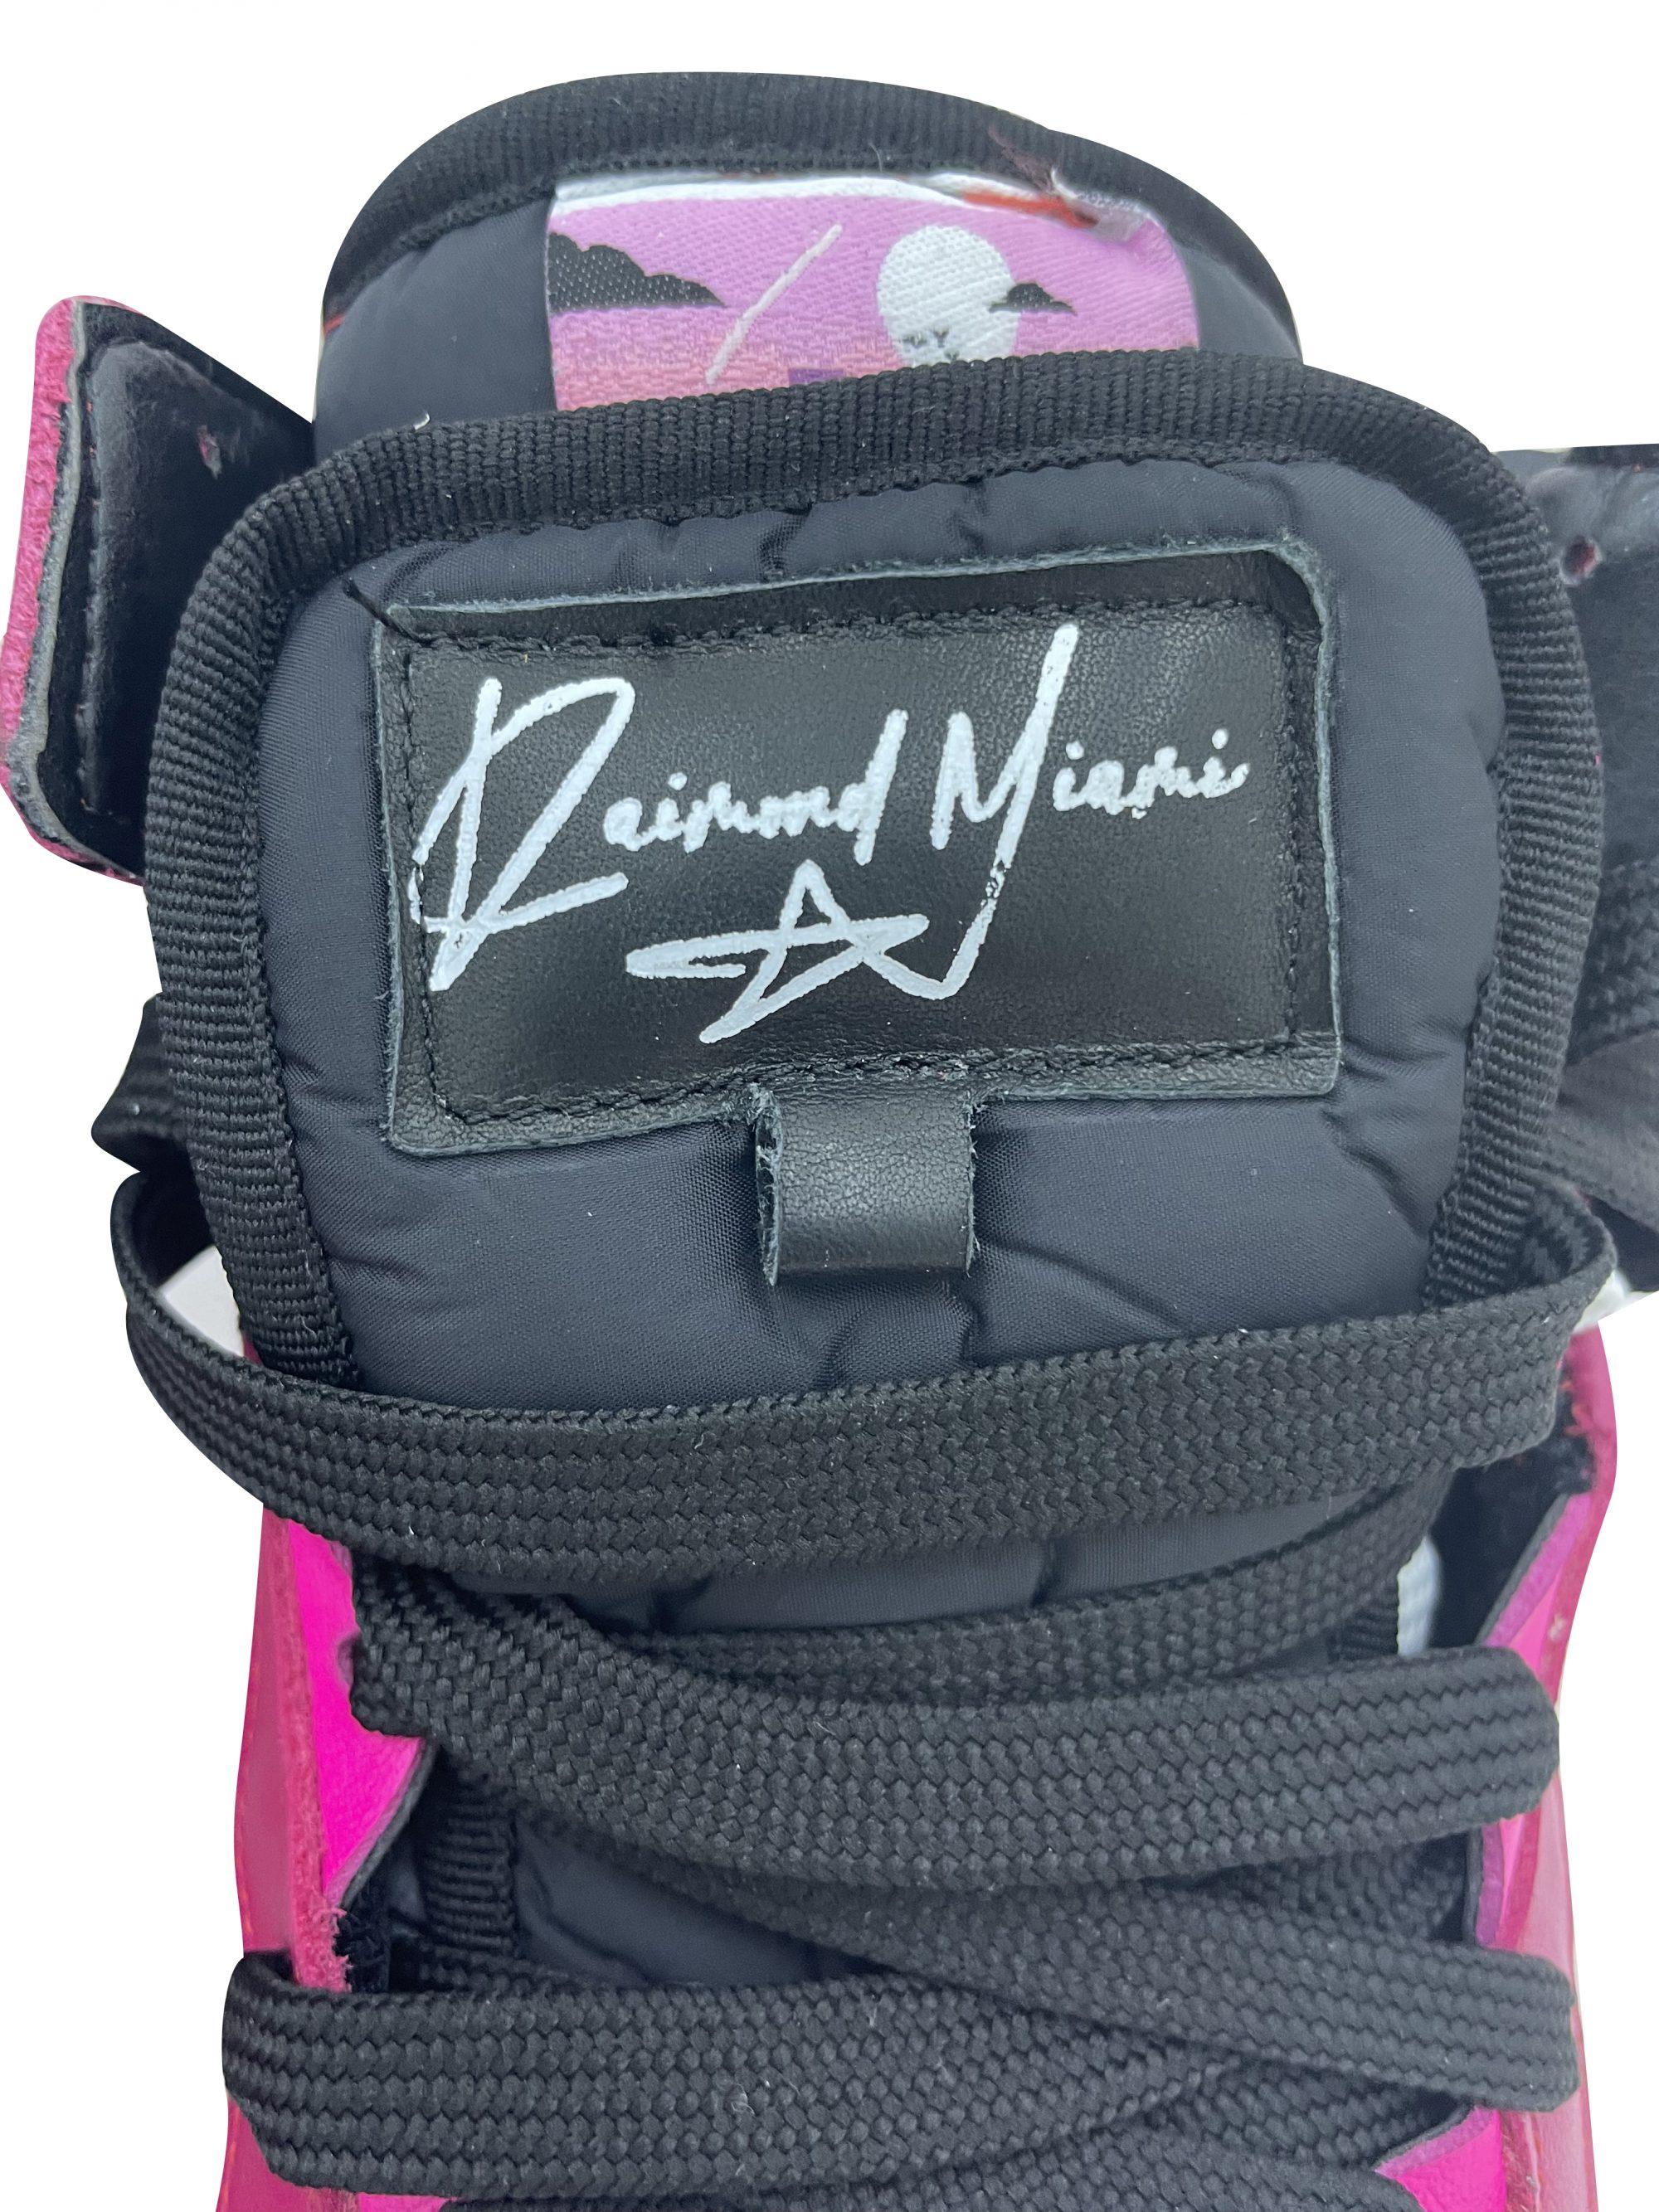 RAIMOND MIAMI FULL METAL LETAL BLACK PINK